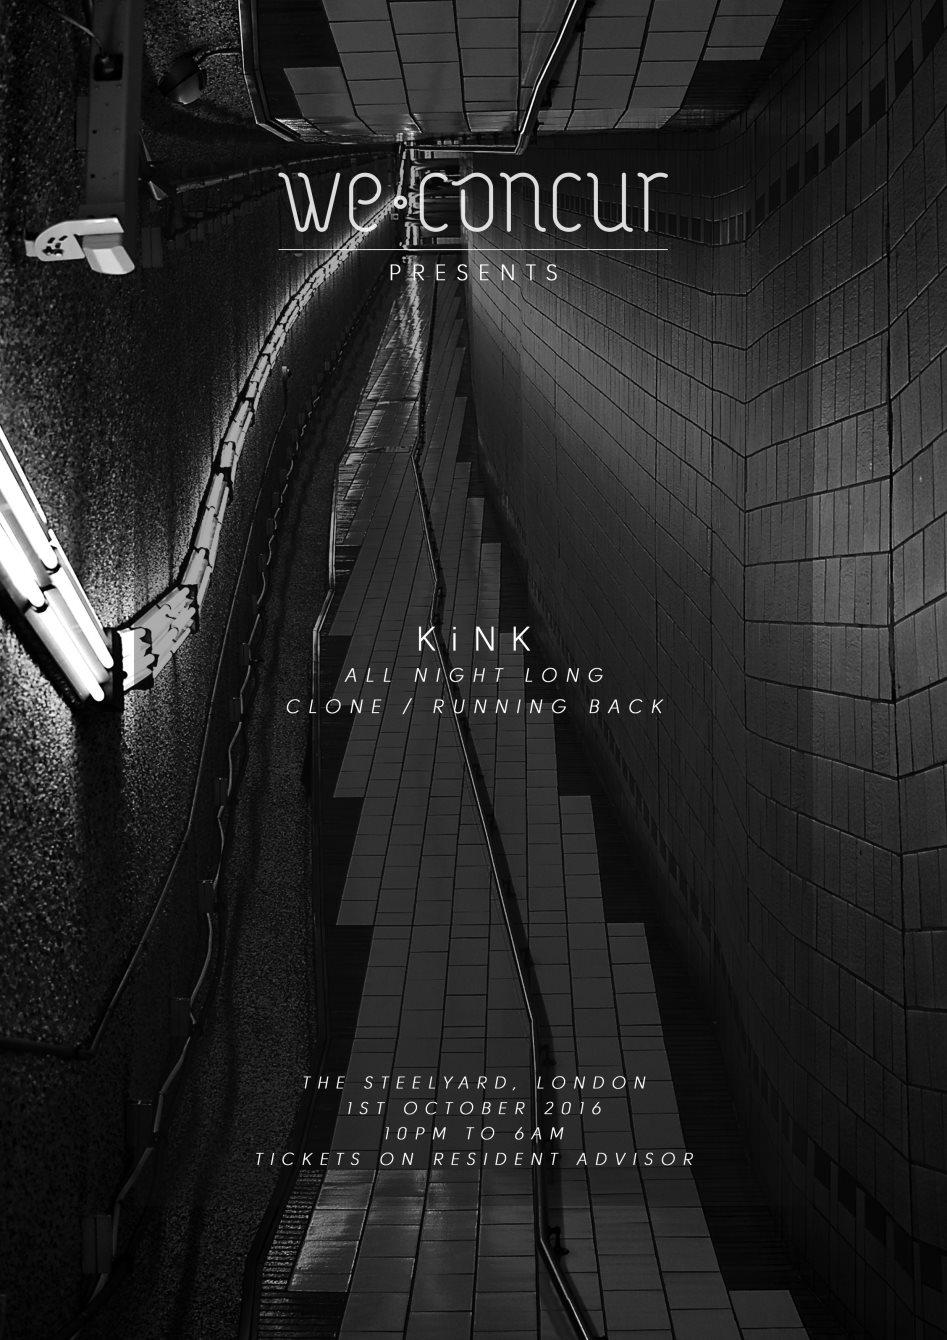 We Concur x Kink - All Night Long - Flyer back